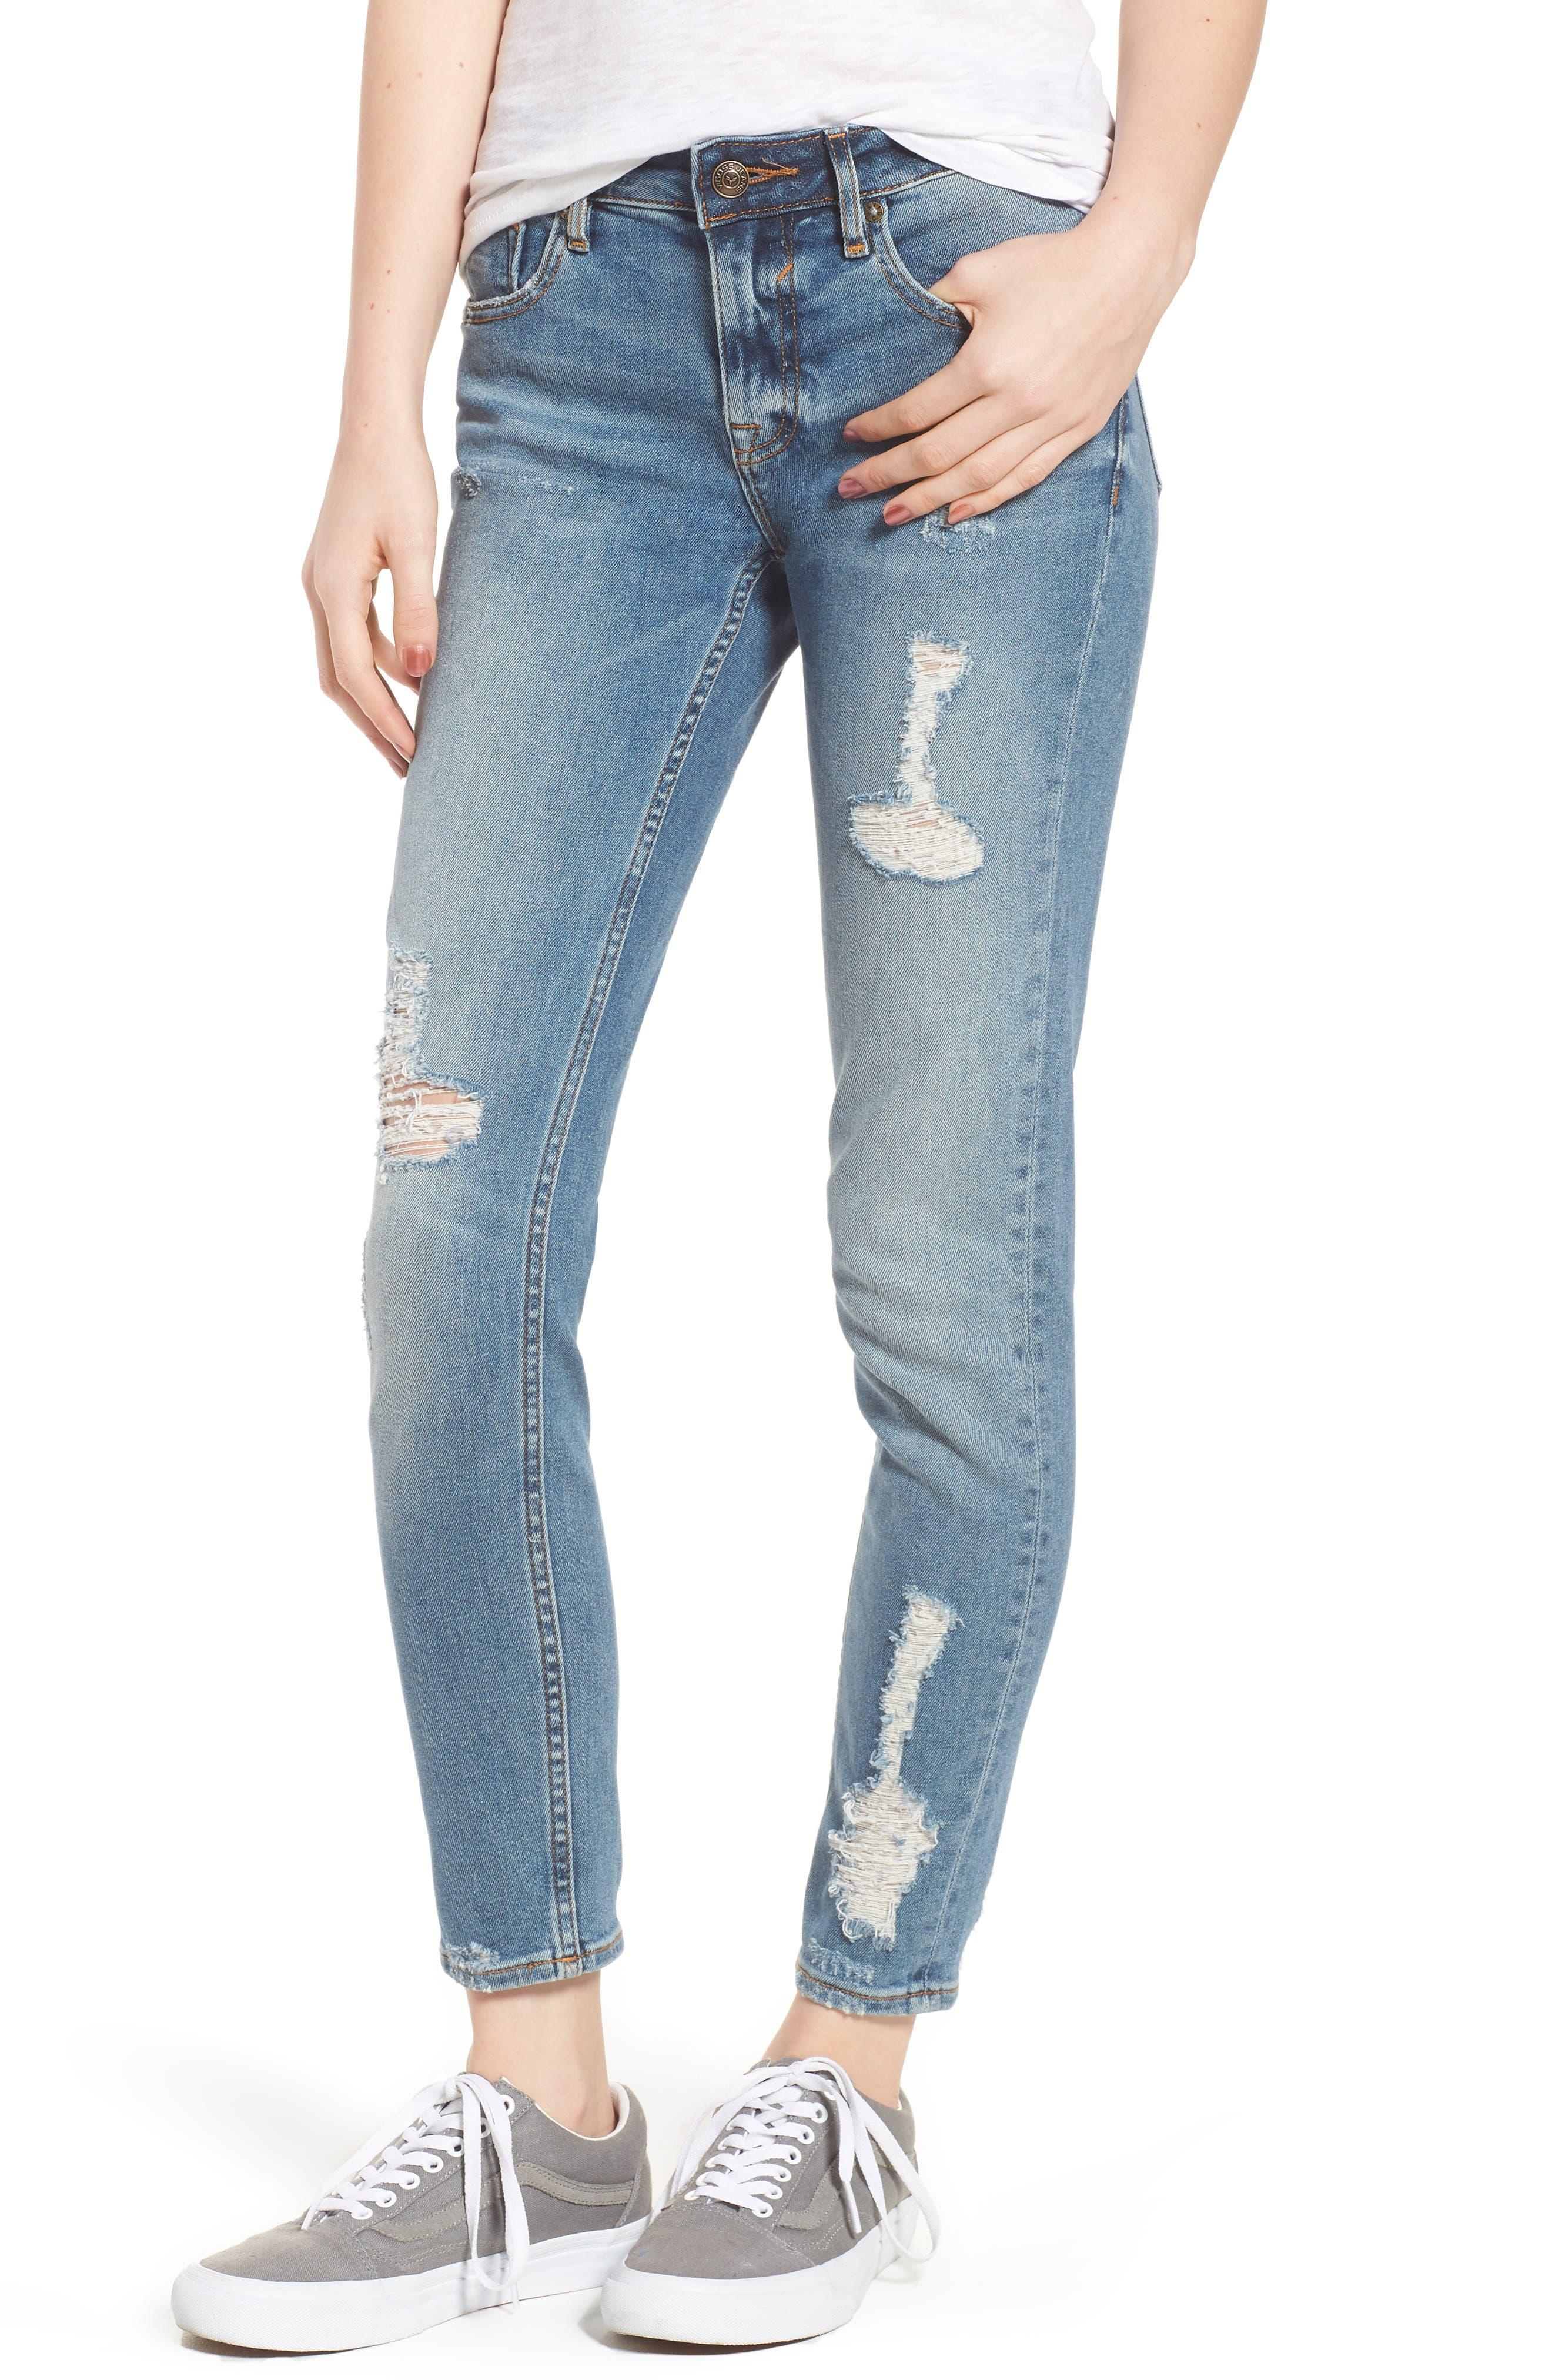 Jagger Decon Distressed Skinny Jeans,                             Main thumbnail 1, color,                             Medium Wash